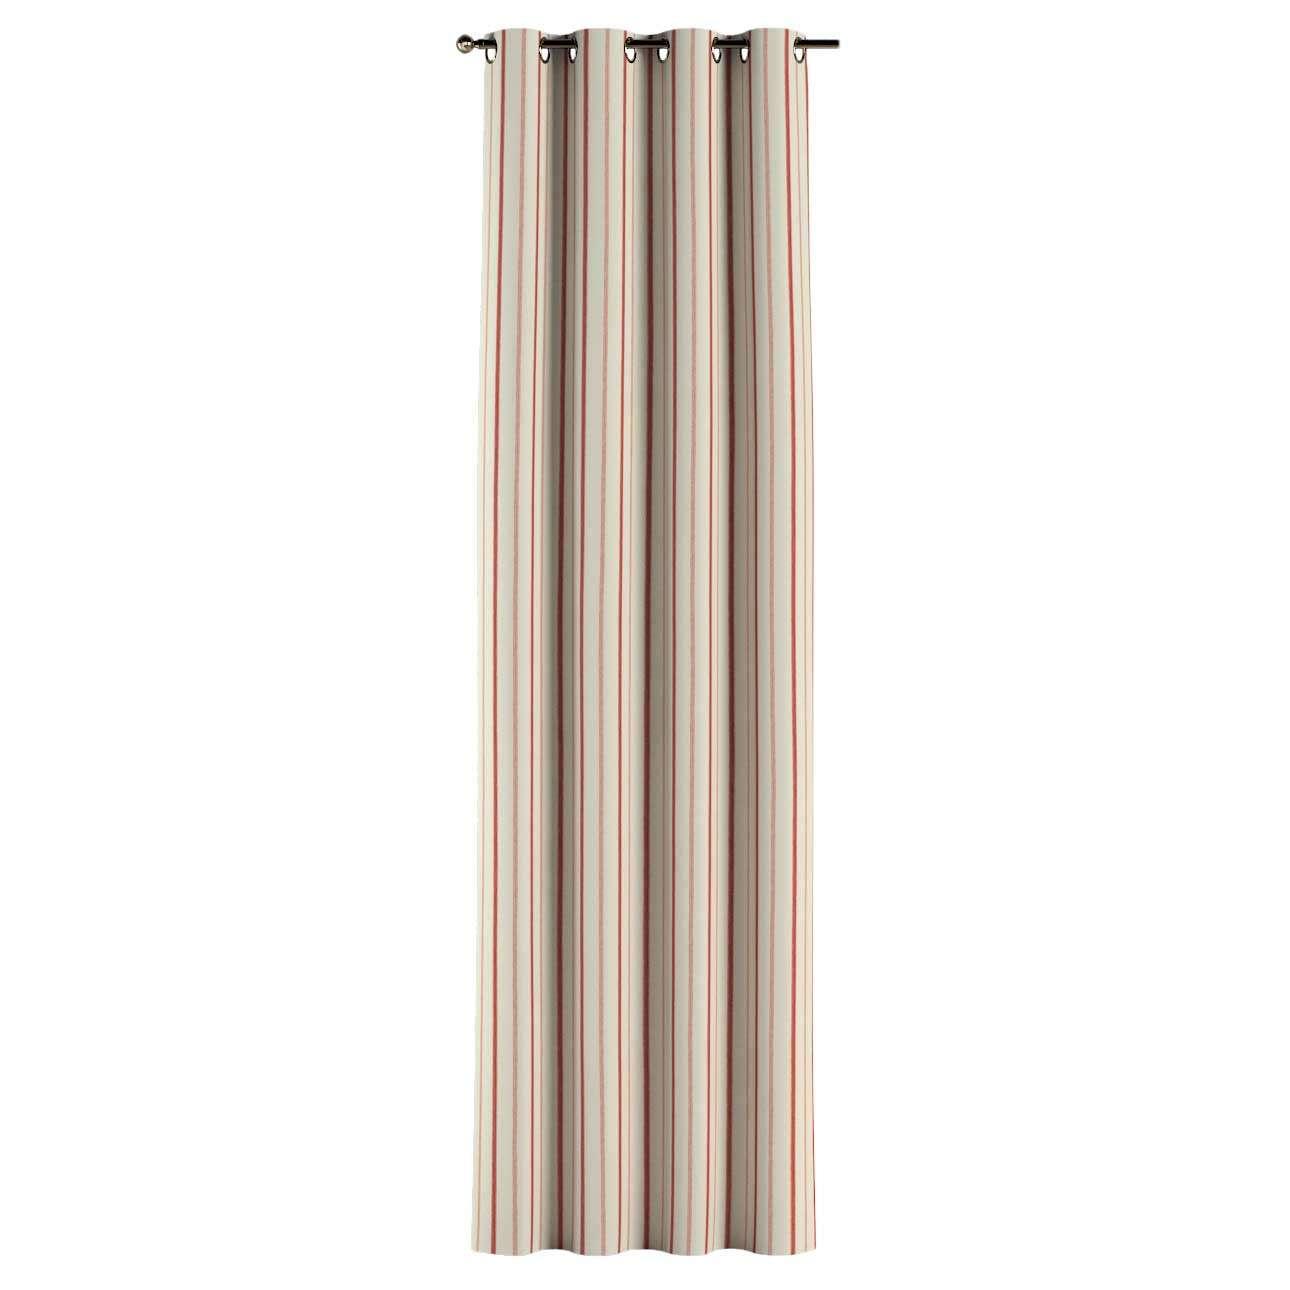 Záves s kolieskami 130 x 260 cm V kolekcii Avinon, tkanina: 129-15